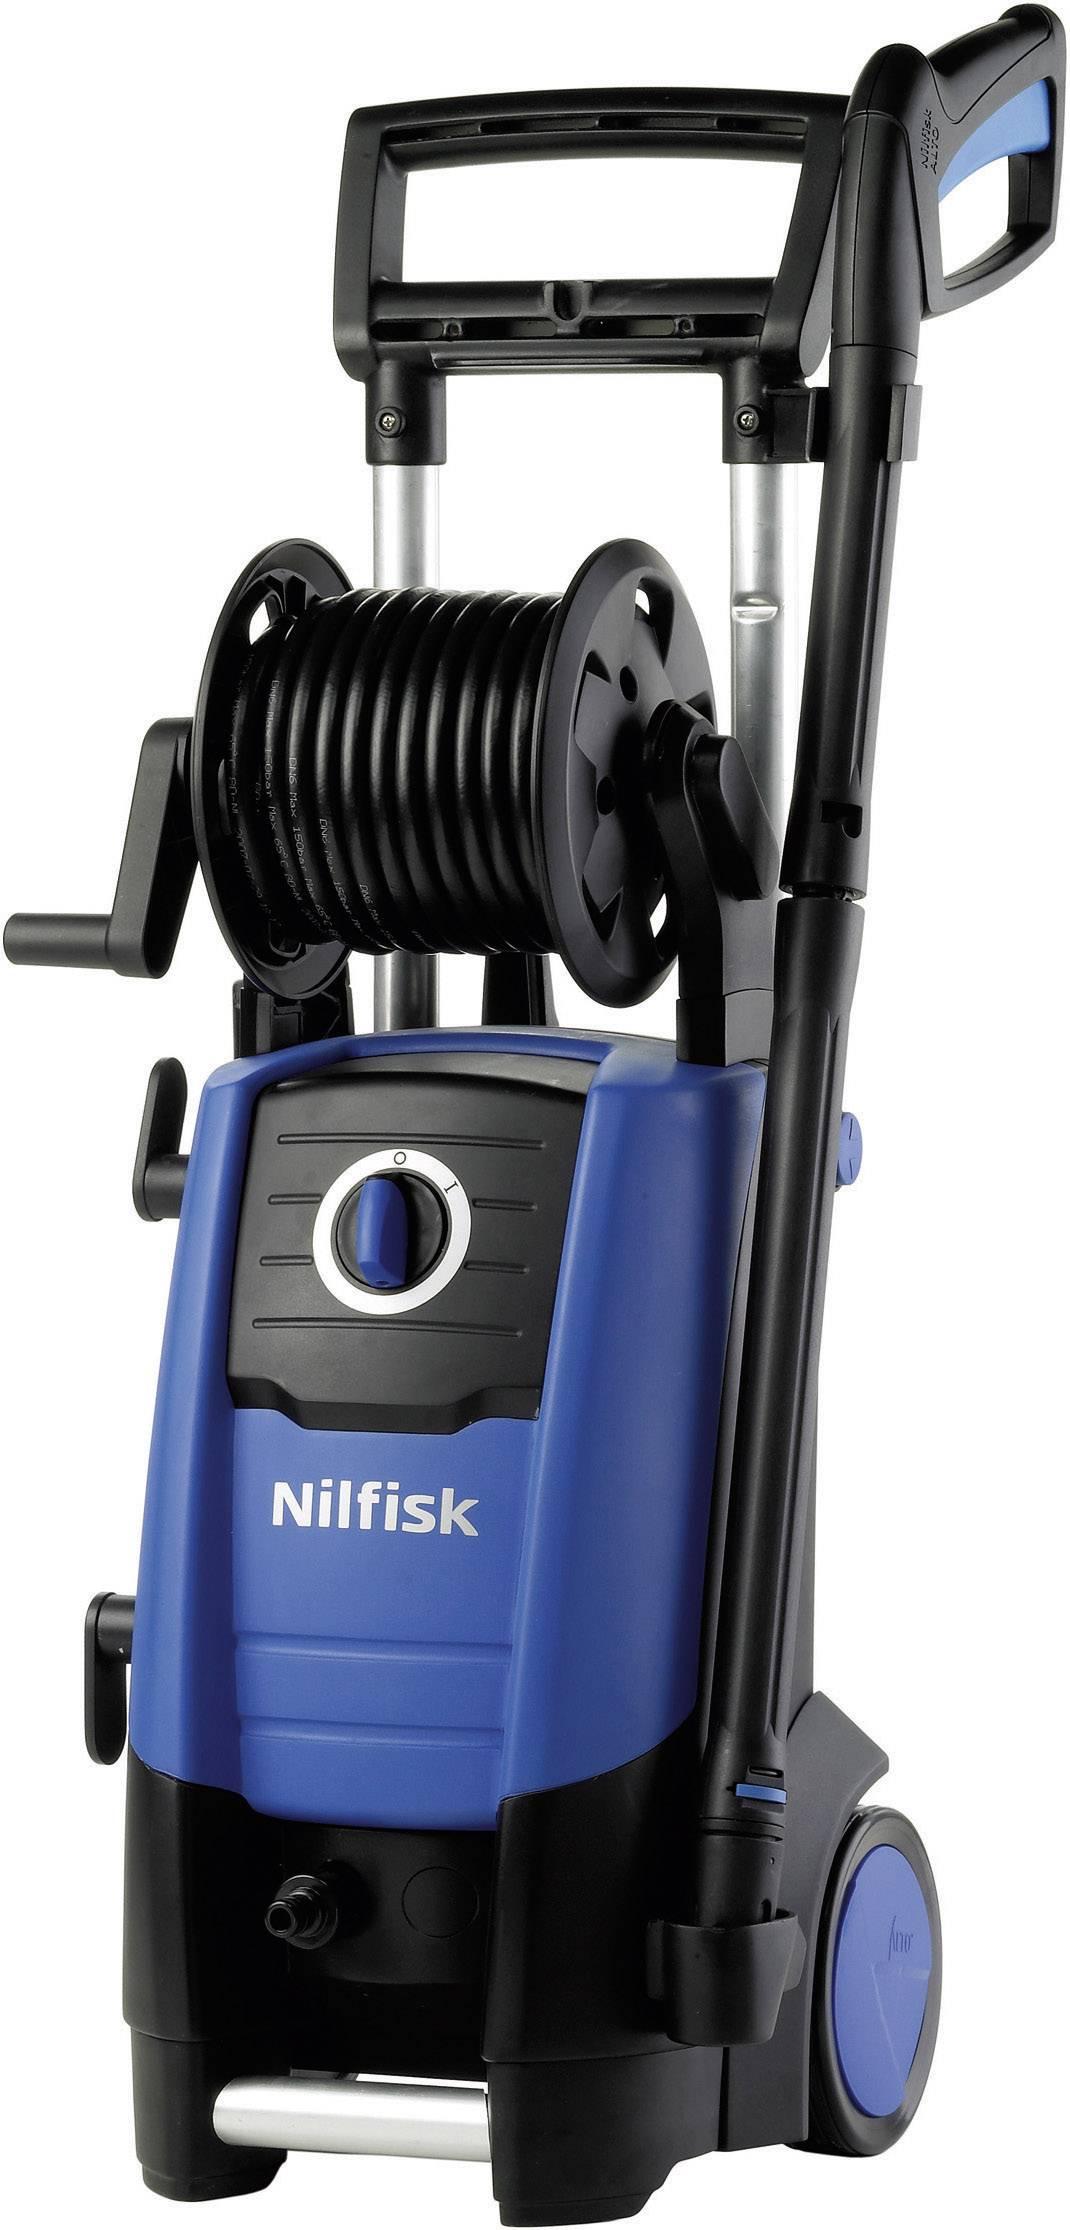 Vysokotlaký čistič vapka Nilfisk Alto E130.2-9 X-tra, 10 - 130 bar, 2100 W